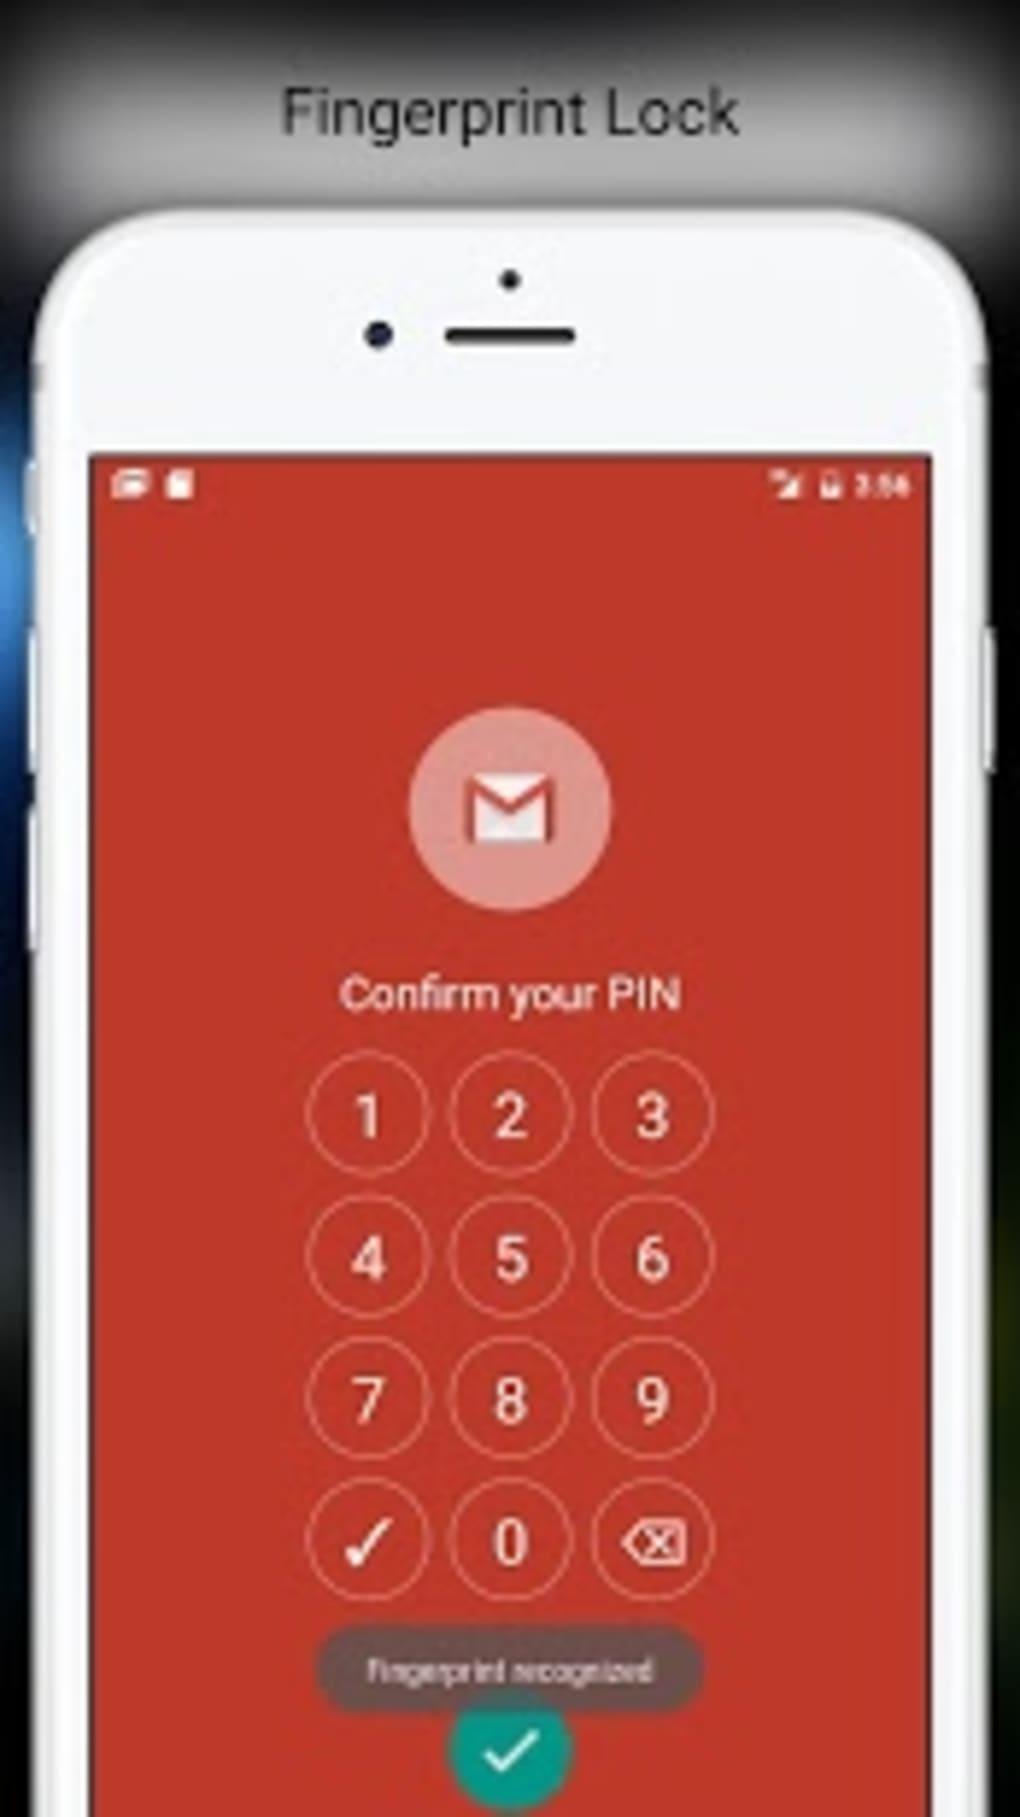 Fingerprint Pattern App Lock for Android - Download